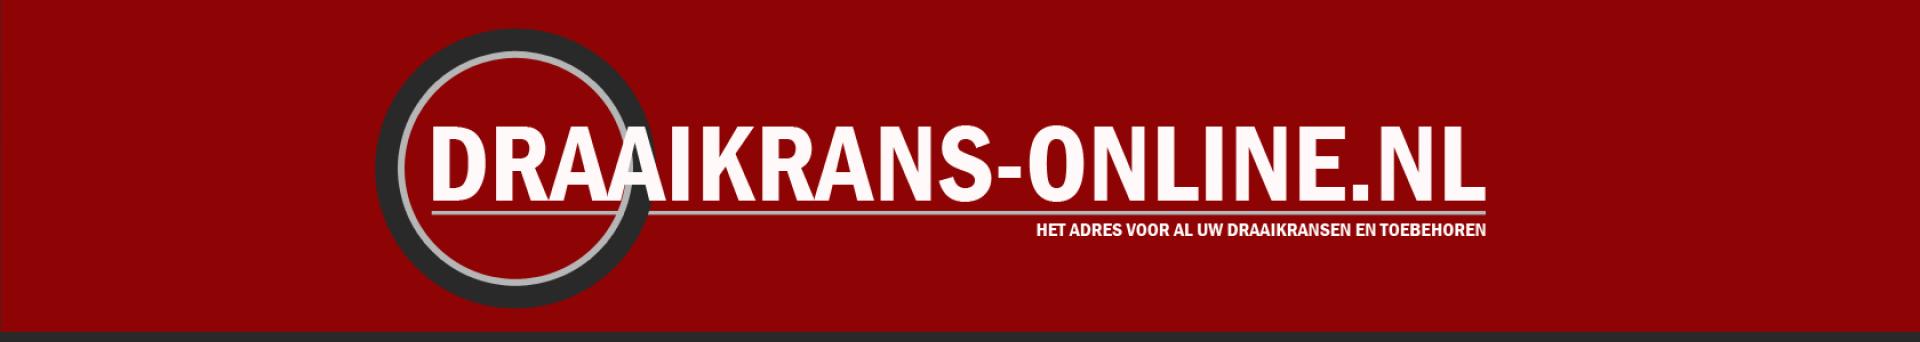 Draaikransonline header